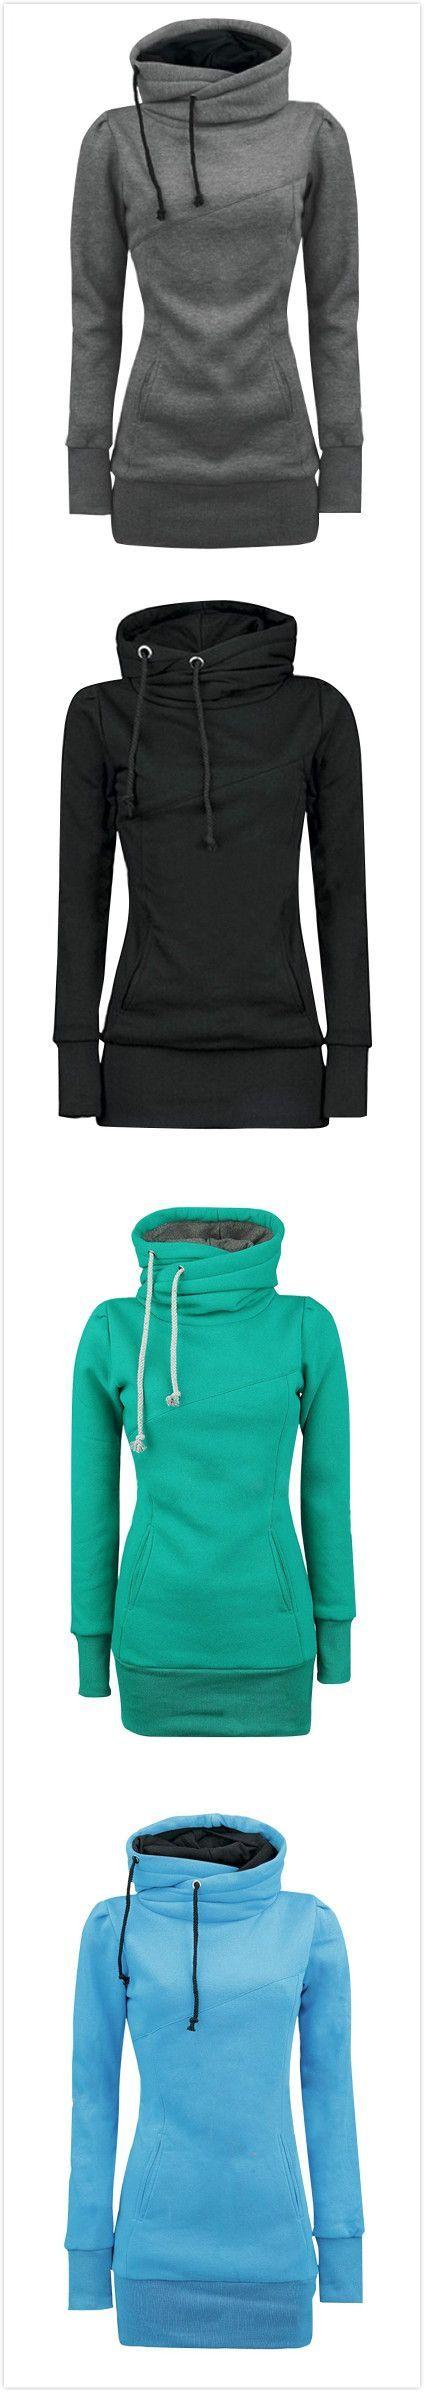 Women's Solid Turtle Neck Long Sleeve Fake Kangaroo Pocket Sweatshirt